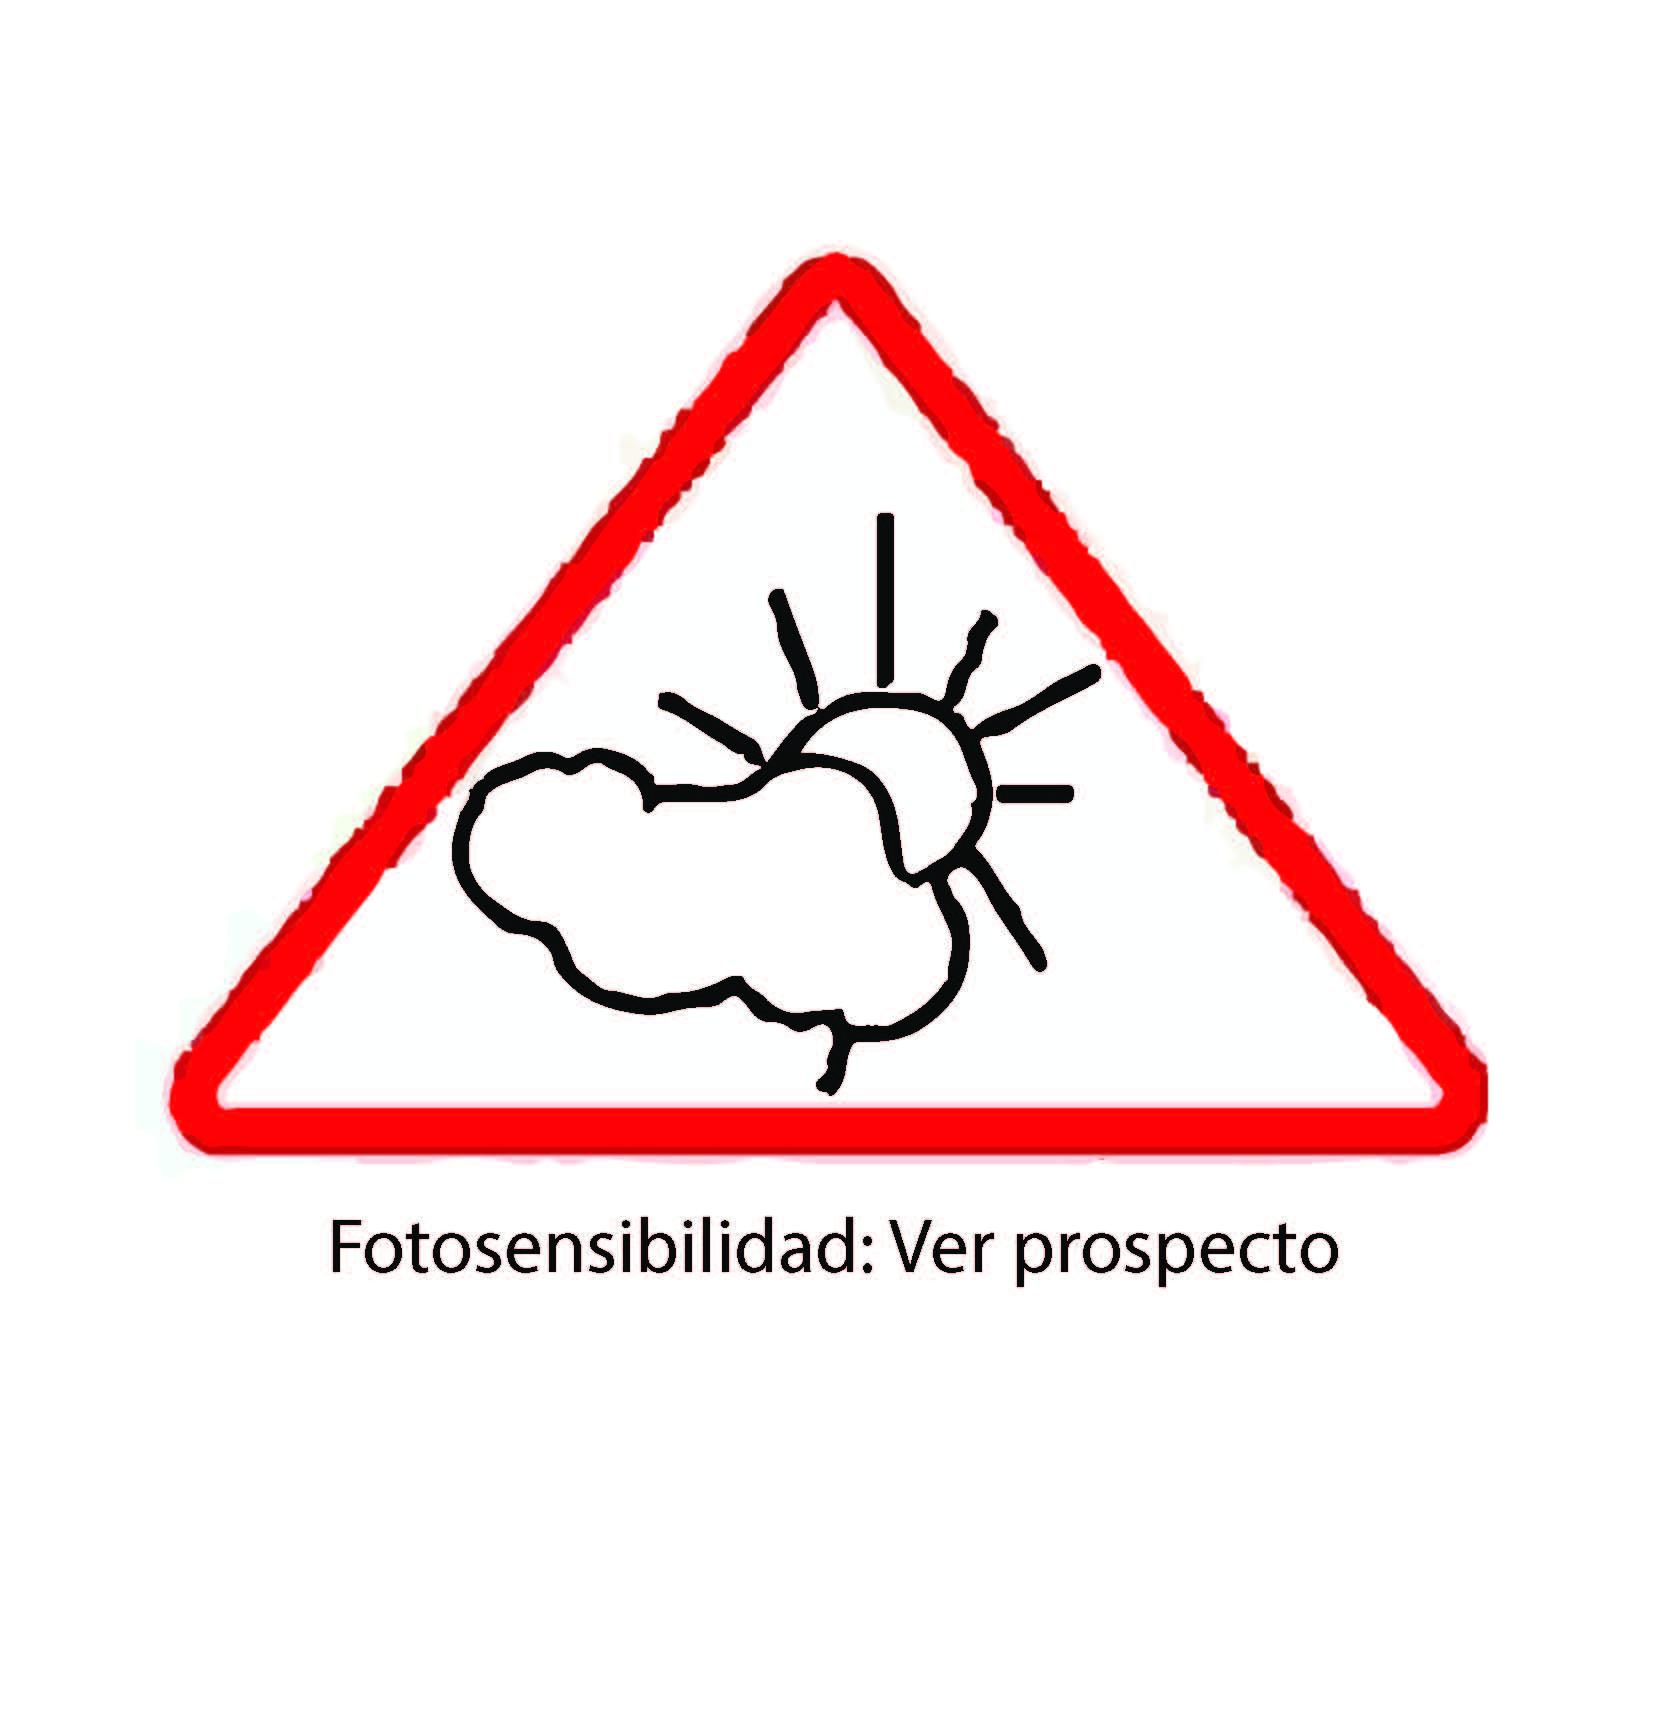 Fotosensibilidad